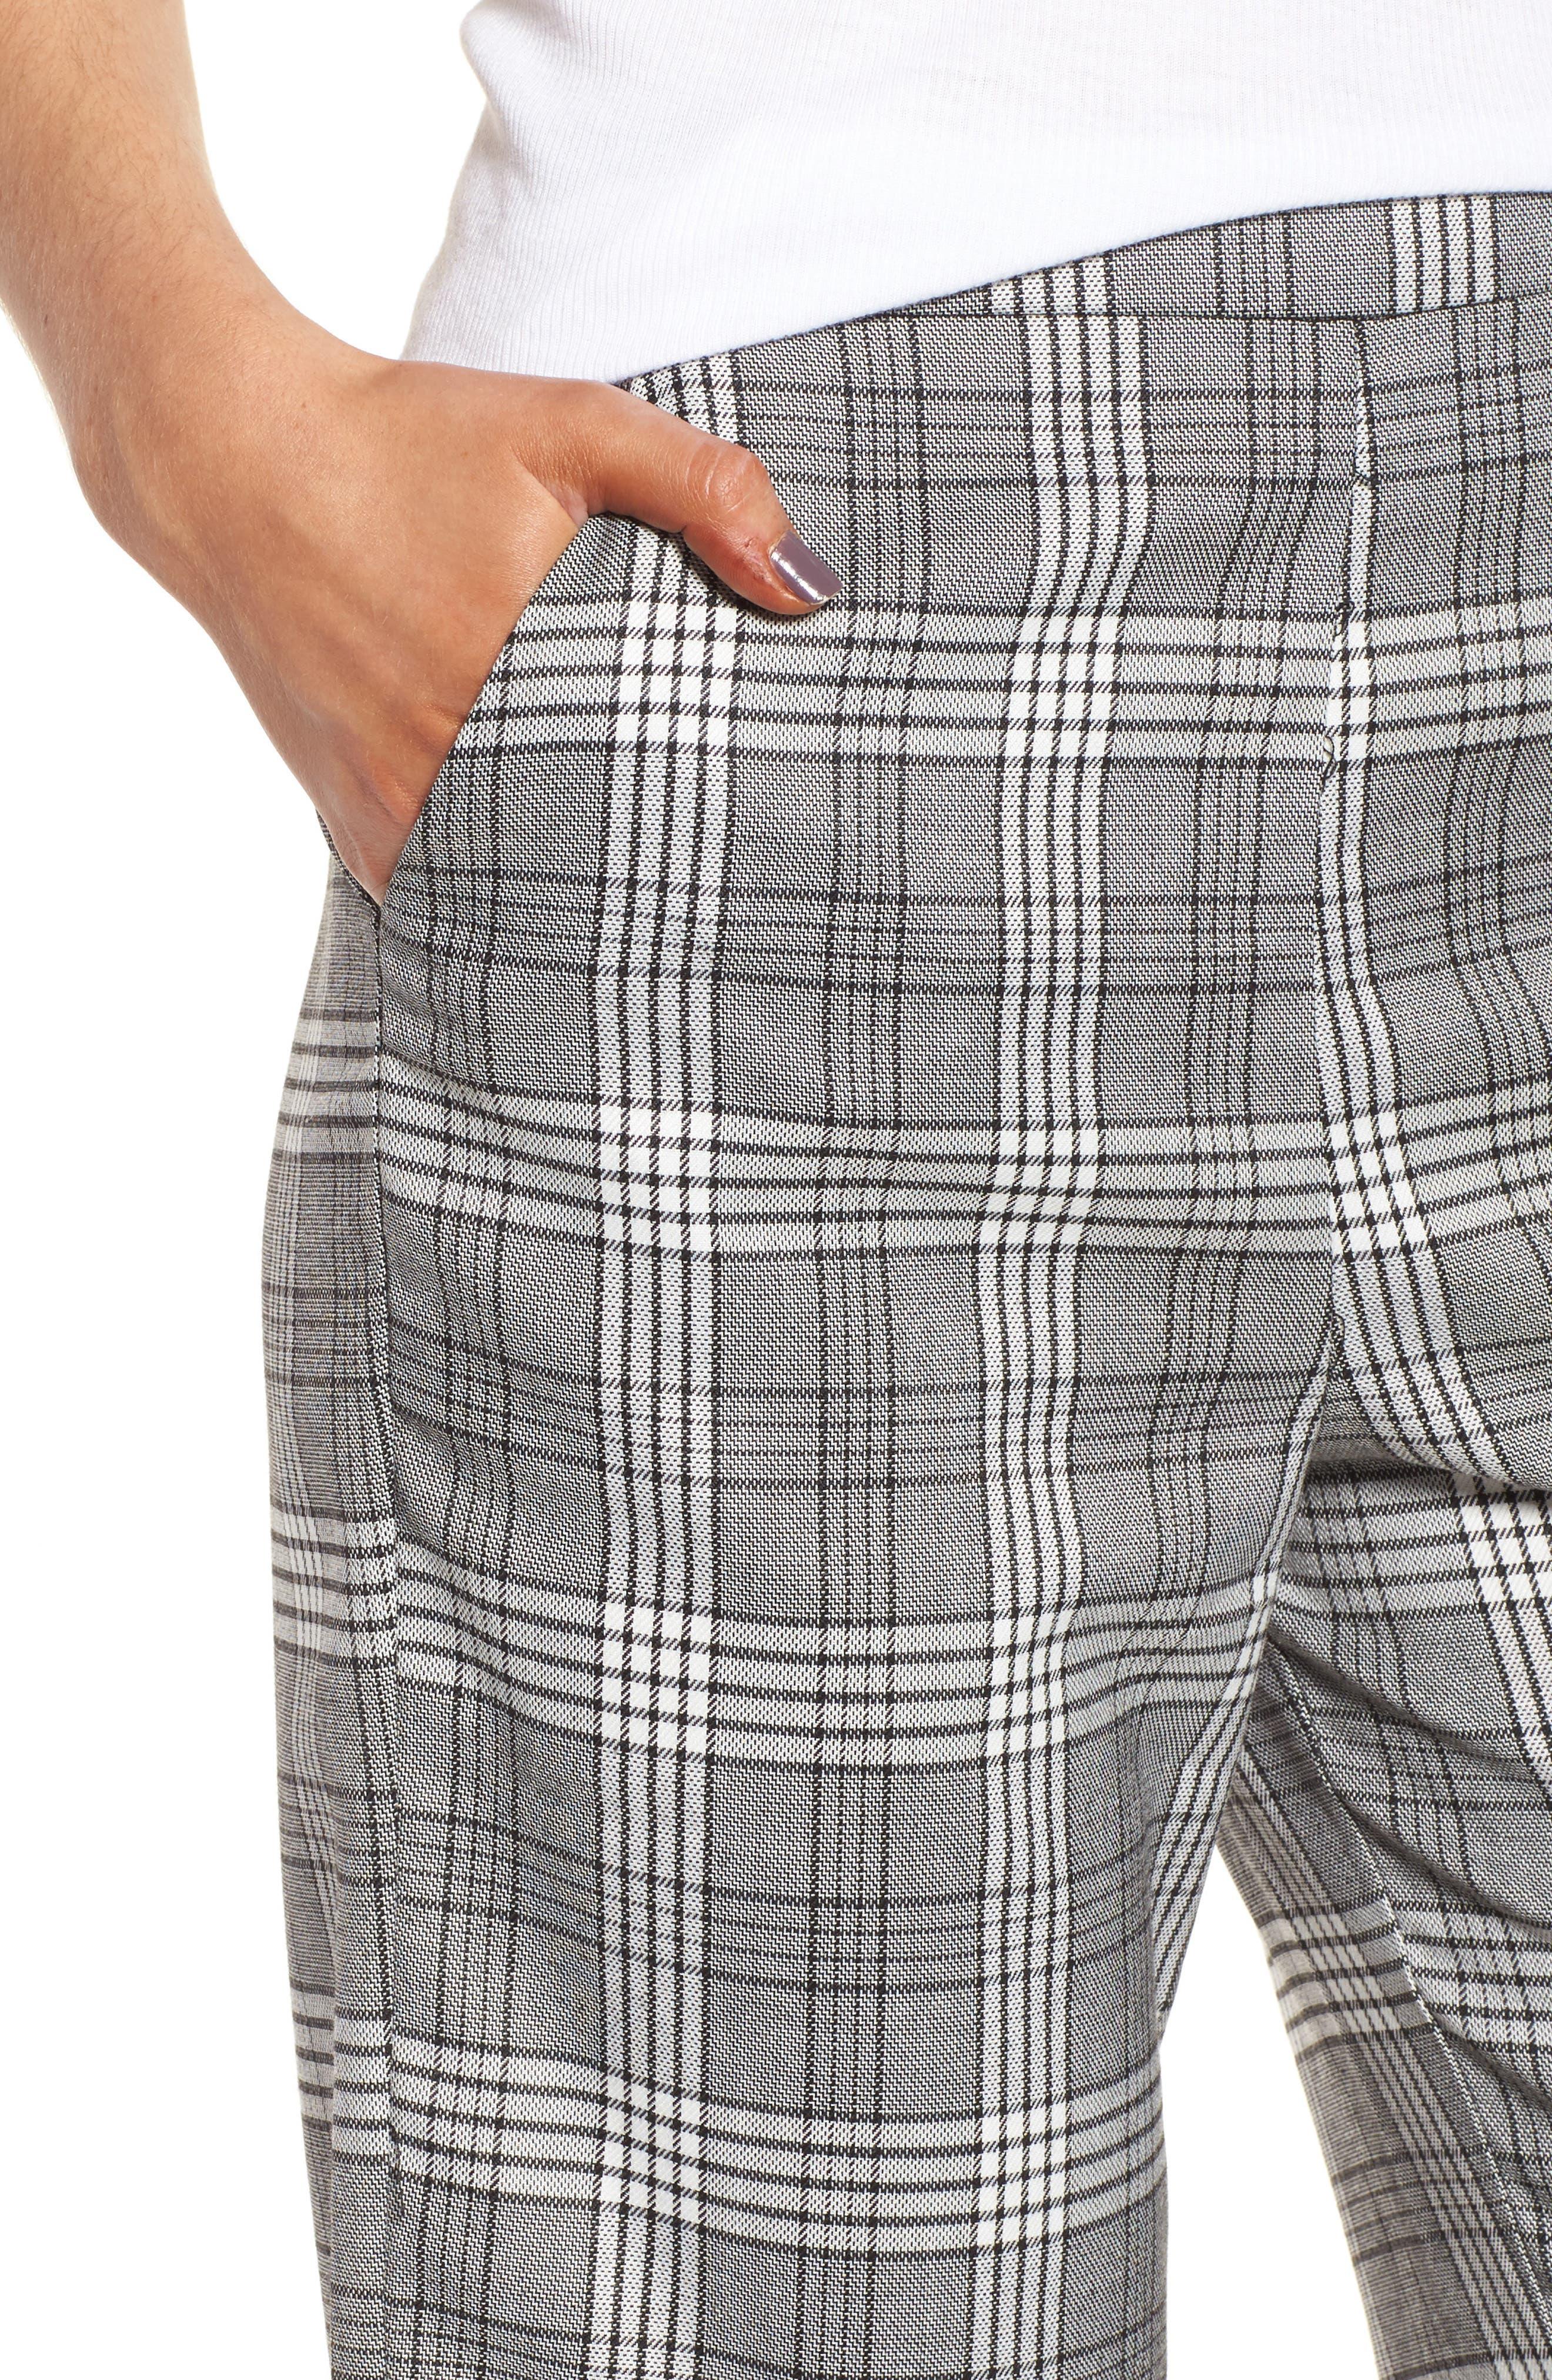 Slater Crop Pants,                             Alternate thumbnail 4, color,                             250